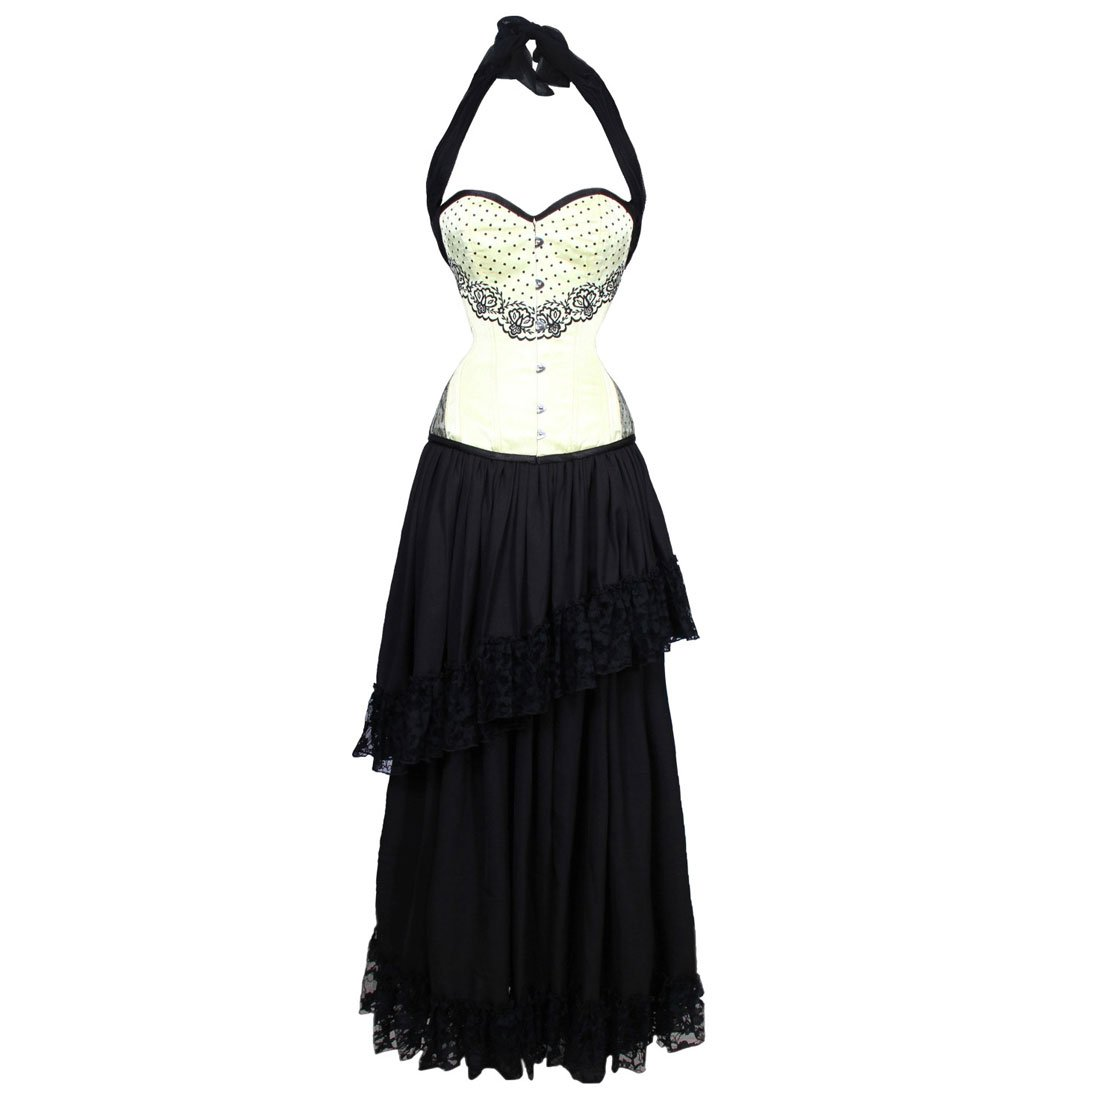 351b54d9c40 Babette Couture Authentic Steel Boned Overbust Corset Dress  Amazon.ca   Clothing   Accessories